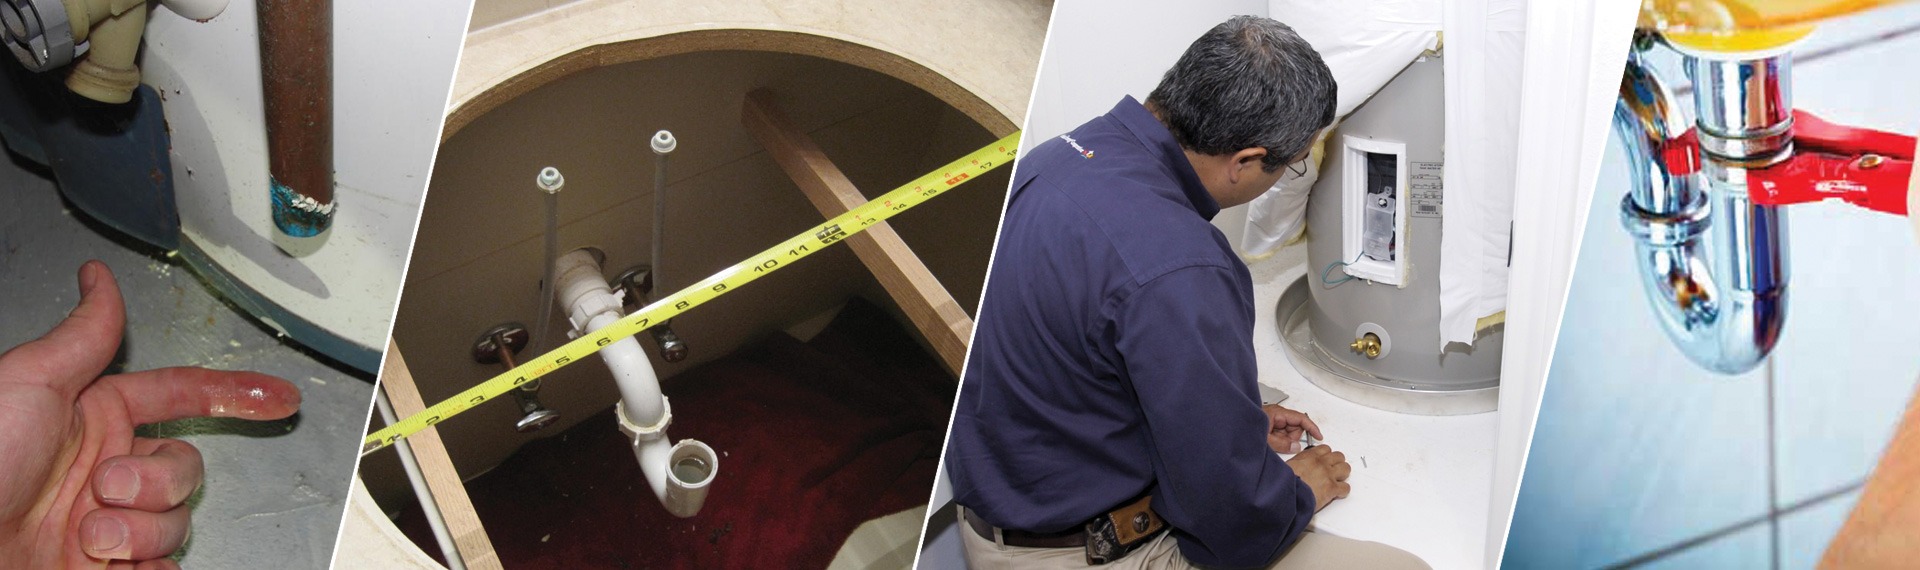 Promax Water Heater & Plumbing Escondido CA